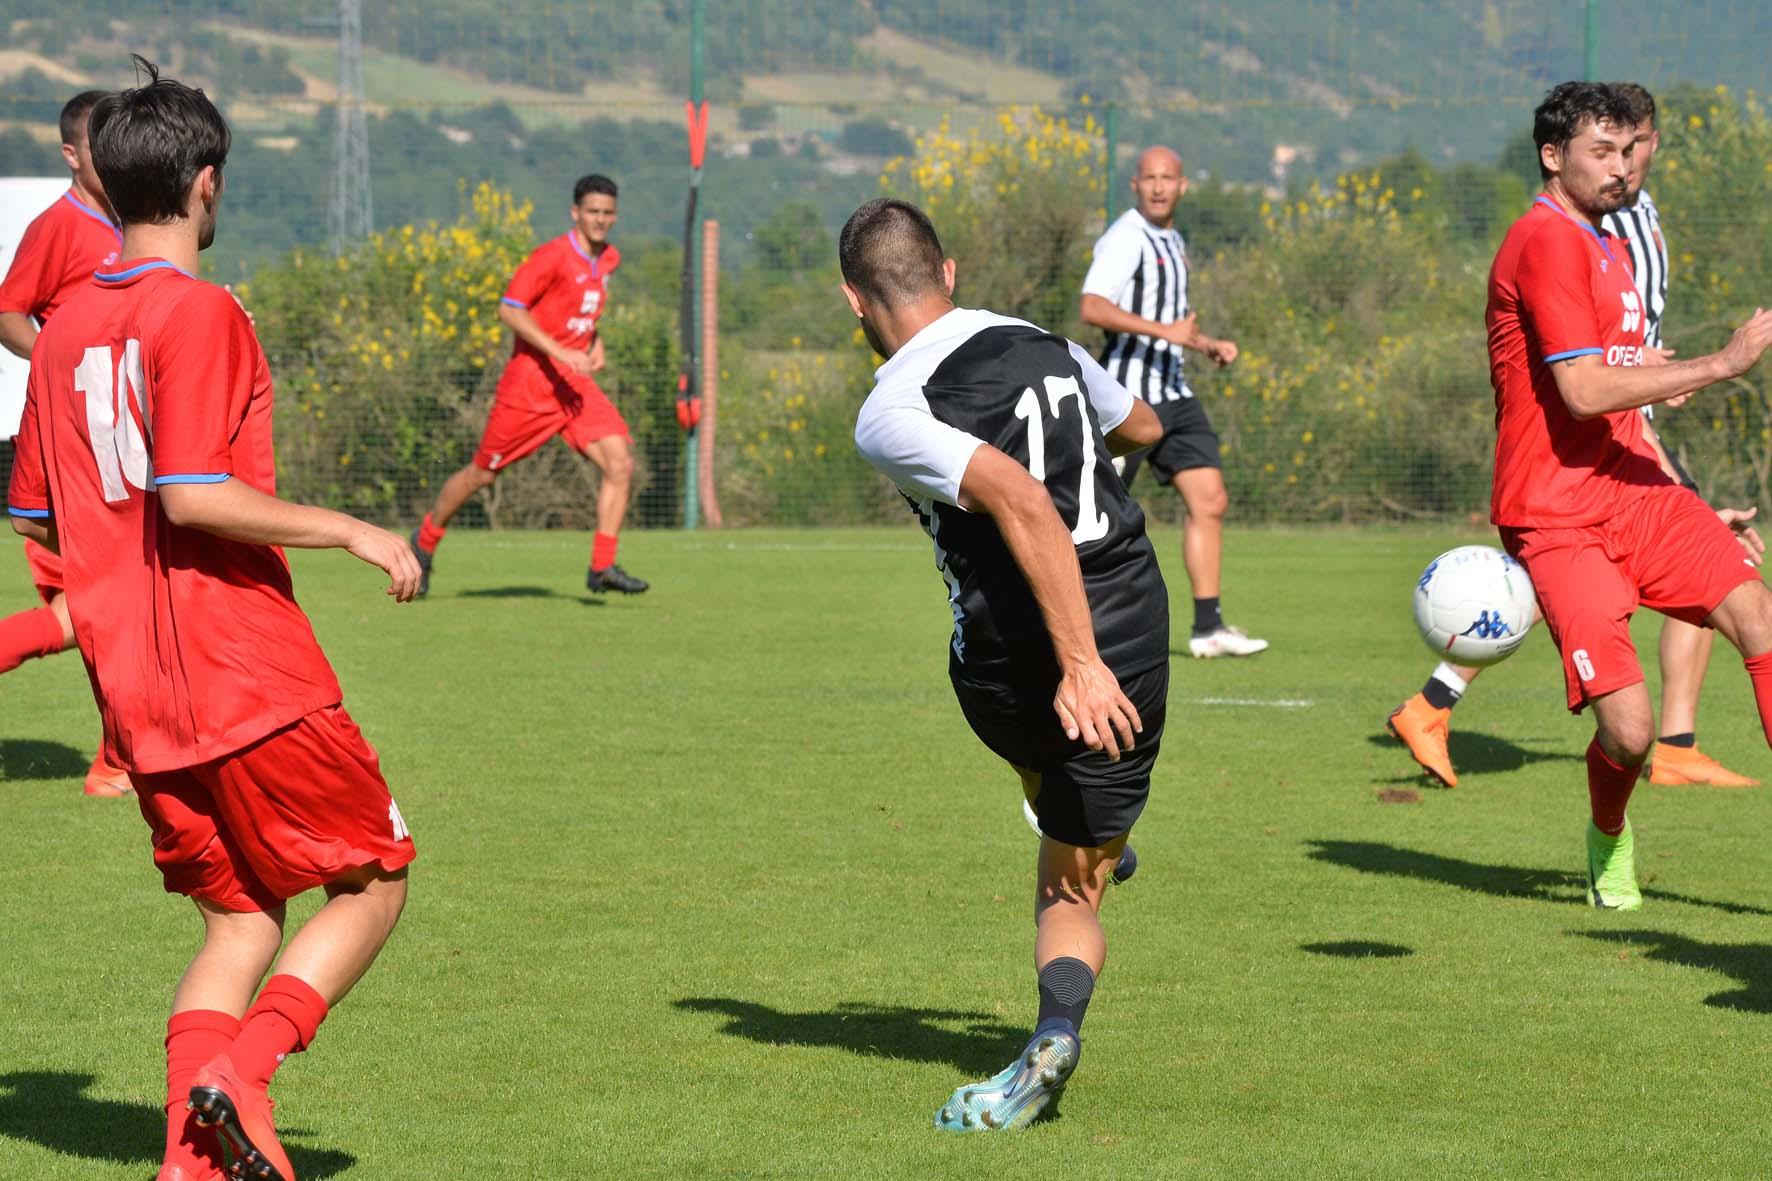 ascoli- atletico ascoli TASSI in gol